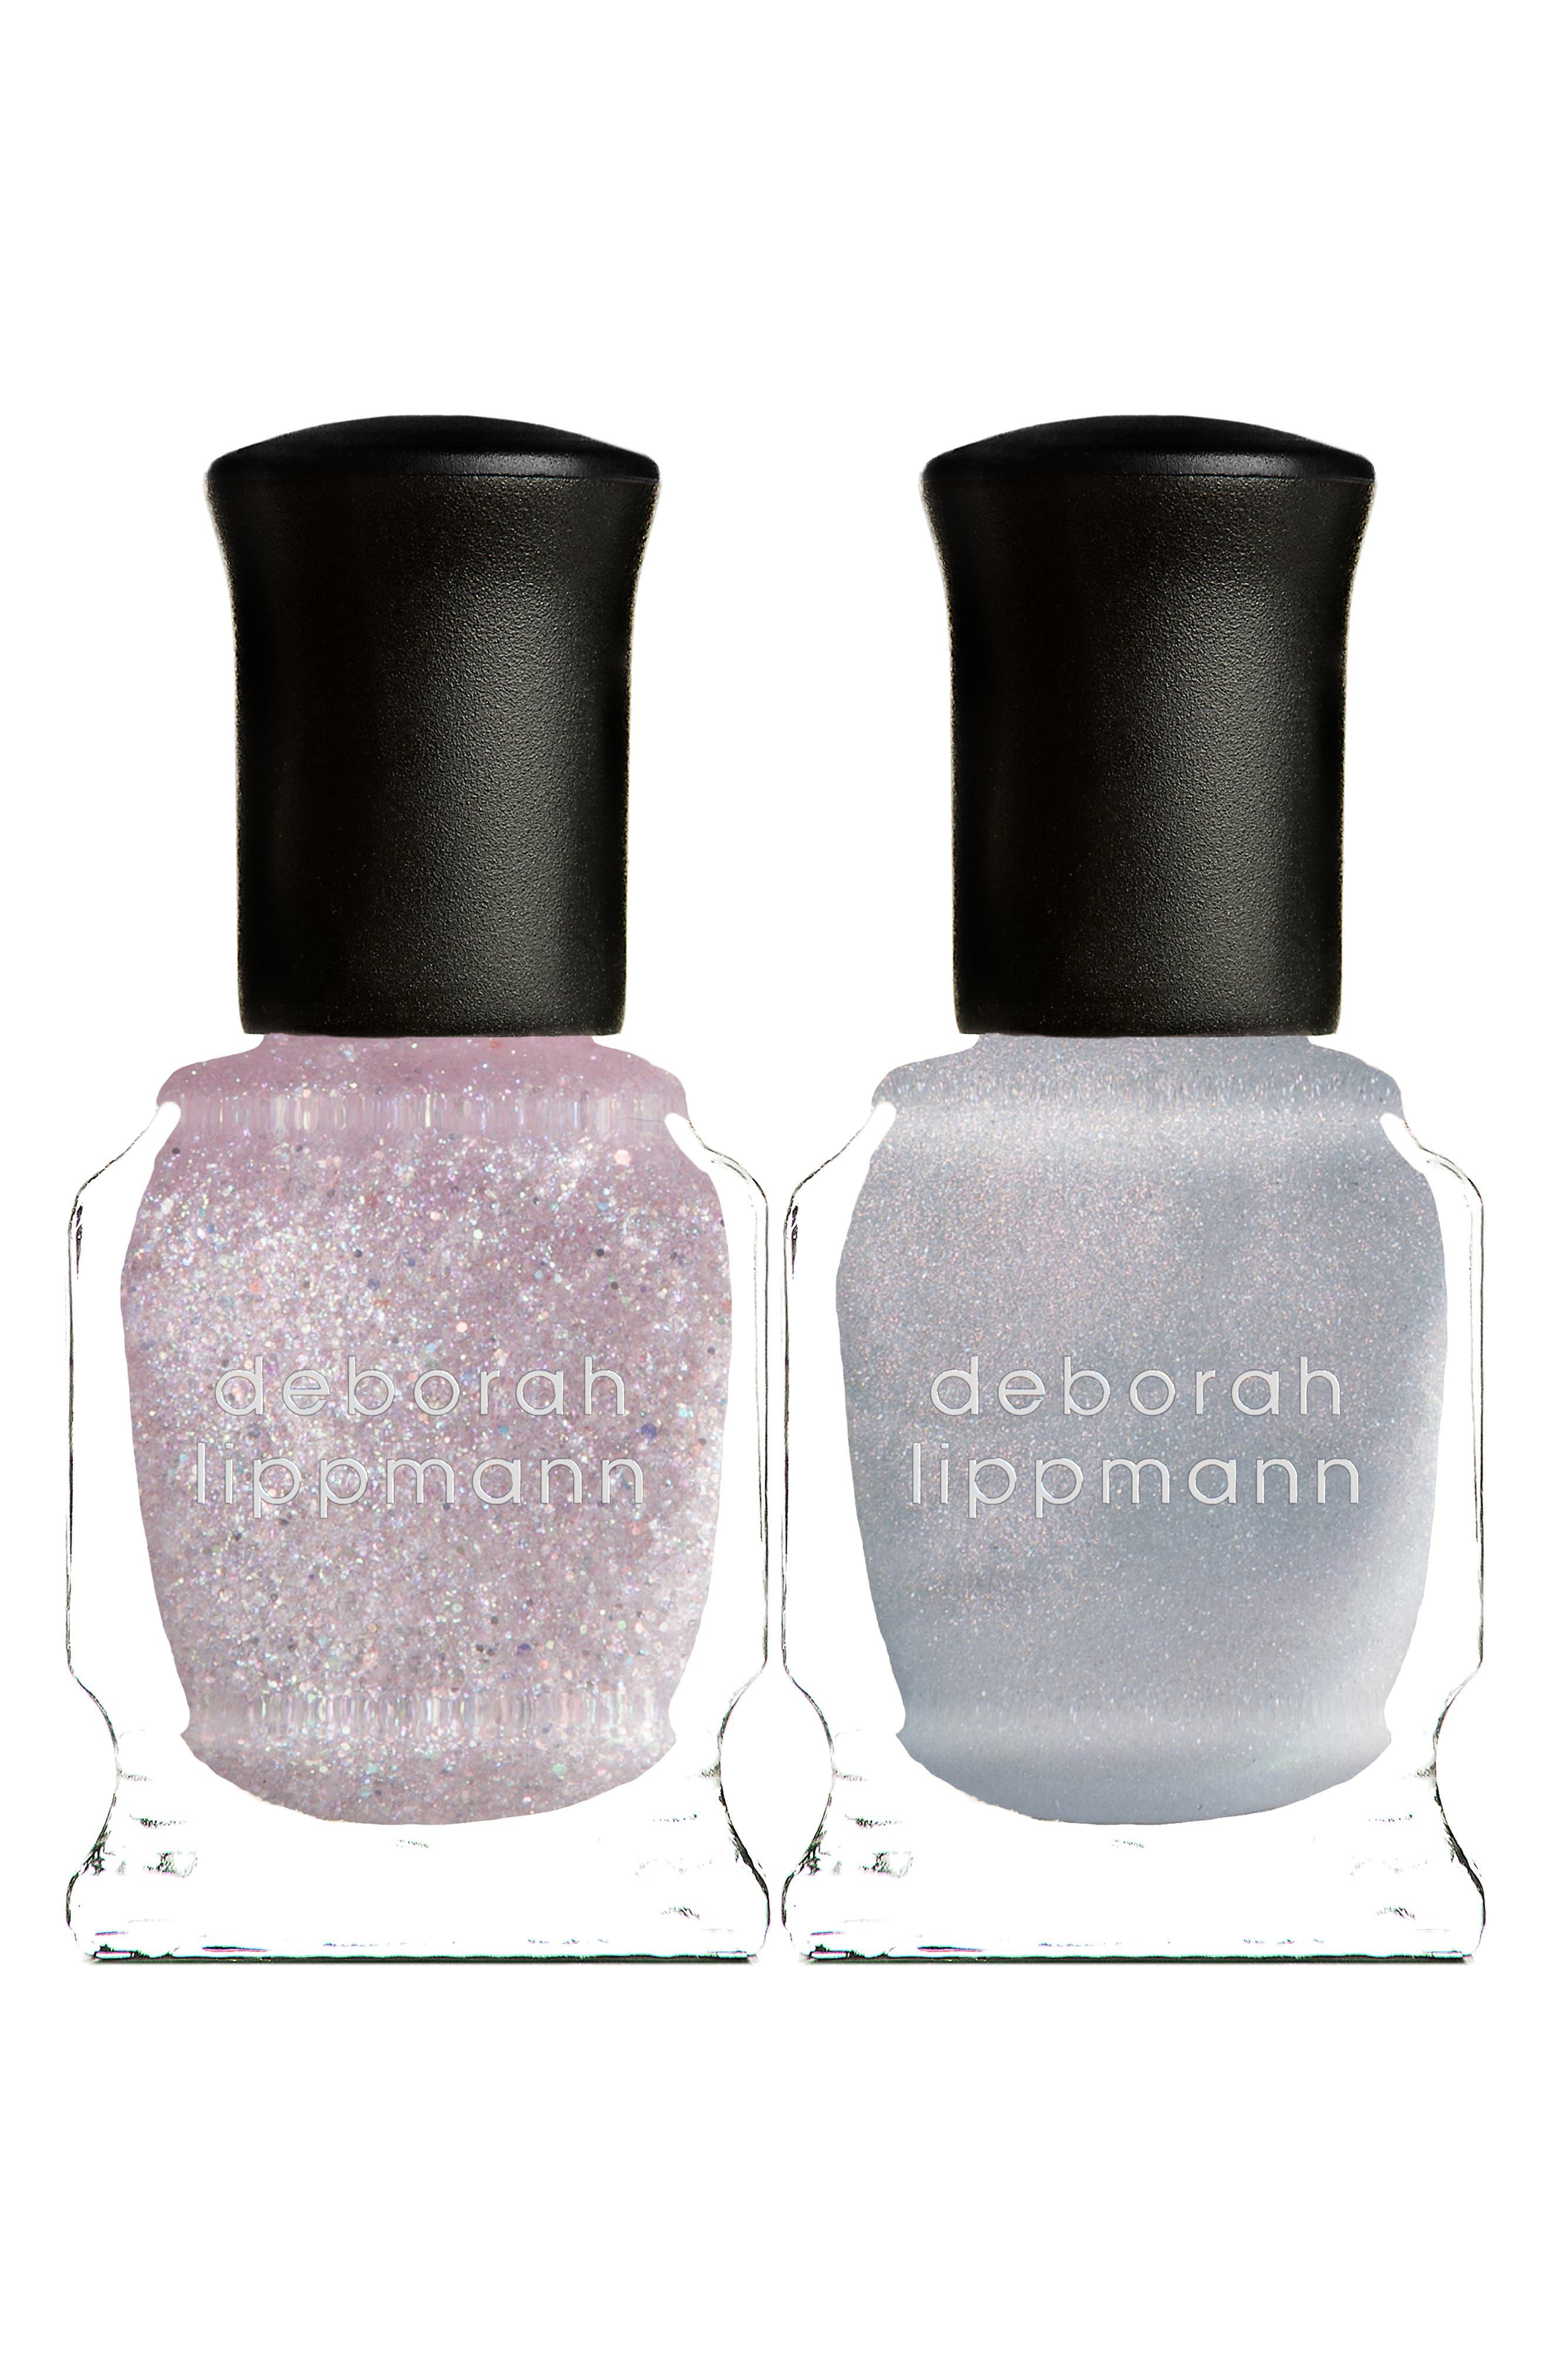 Deborah Lippmann Winter Romance Gel Lab Pro Nail Color Duo - Winter Romance Set